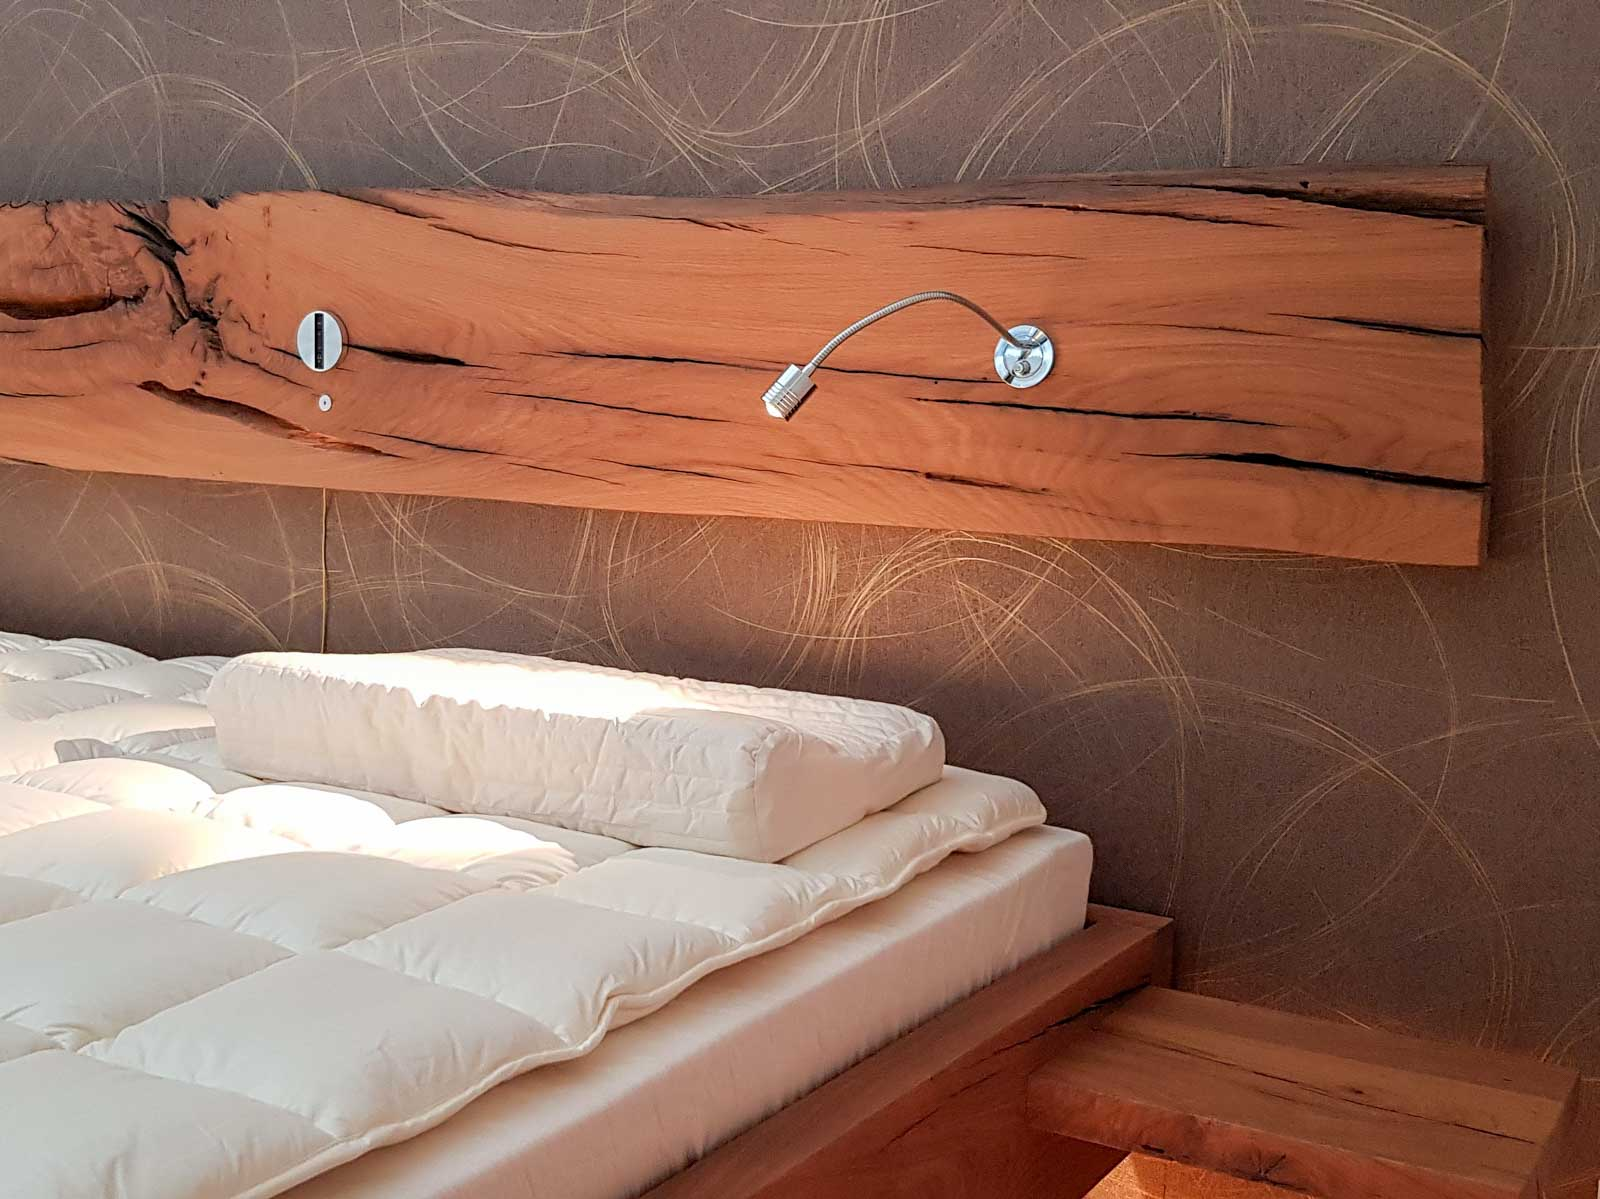 Wooddesign_Bett_Trinatura_Altholz_Eiche_Beleuchtung_indirekte Beleuchtung_Schublade (6)